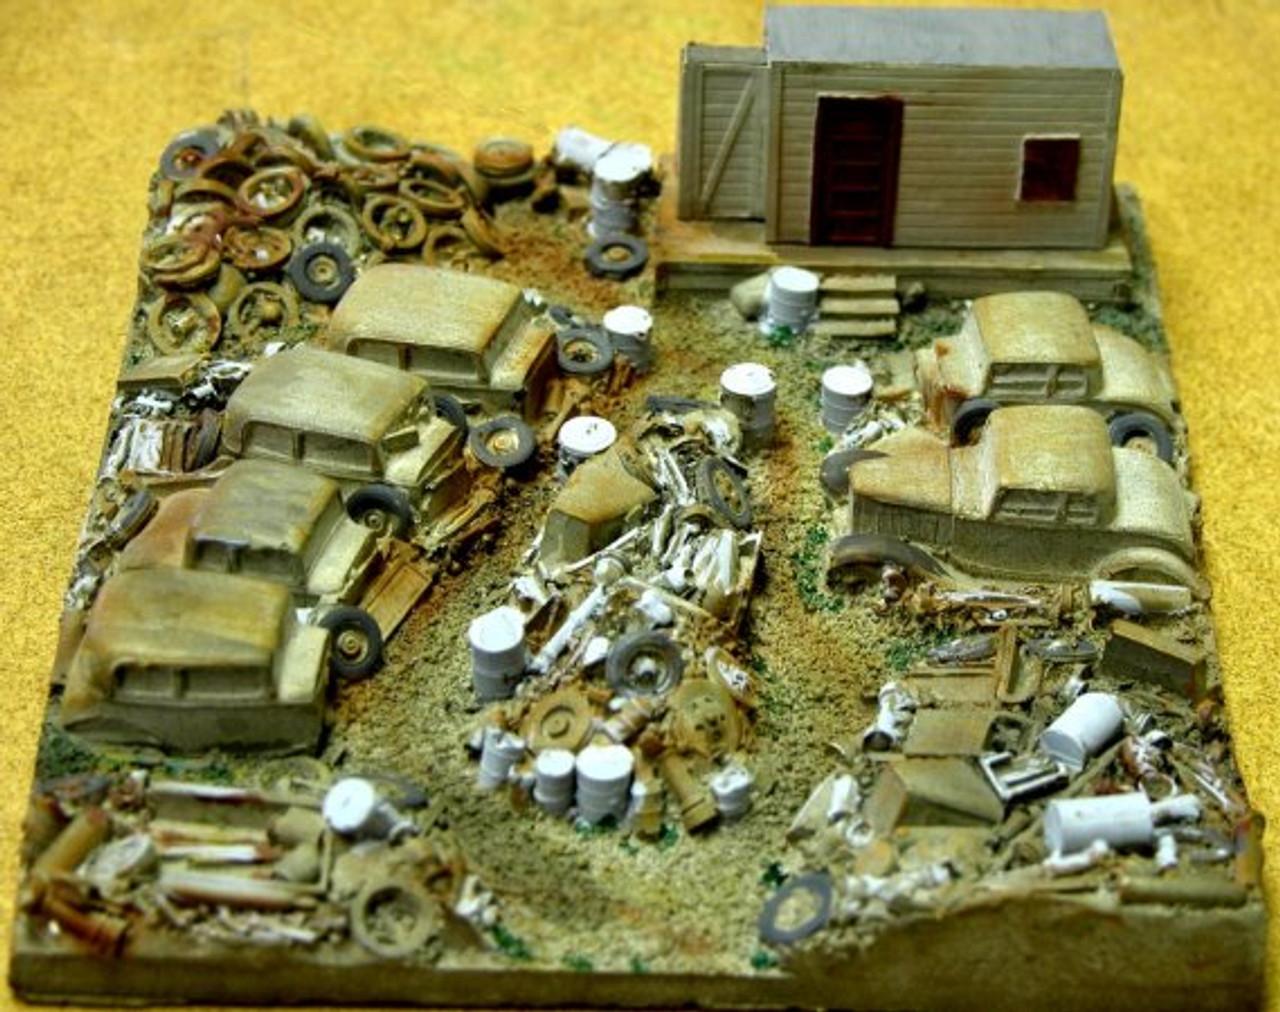 Automobile Junk Yard Kit